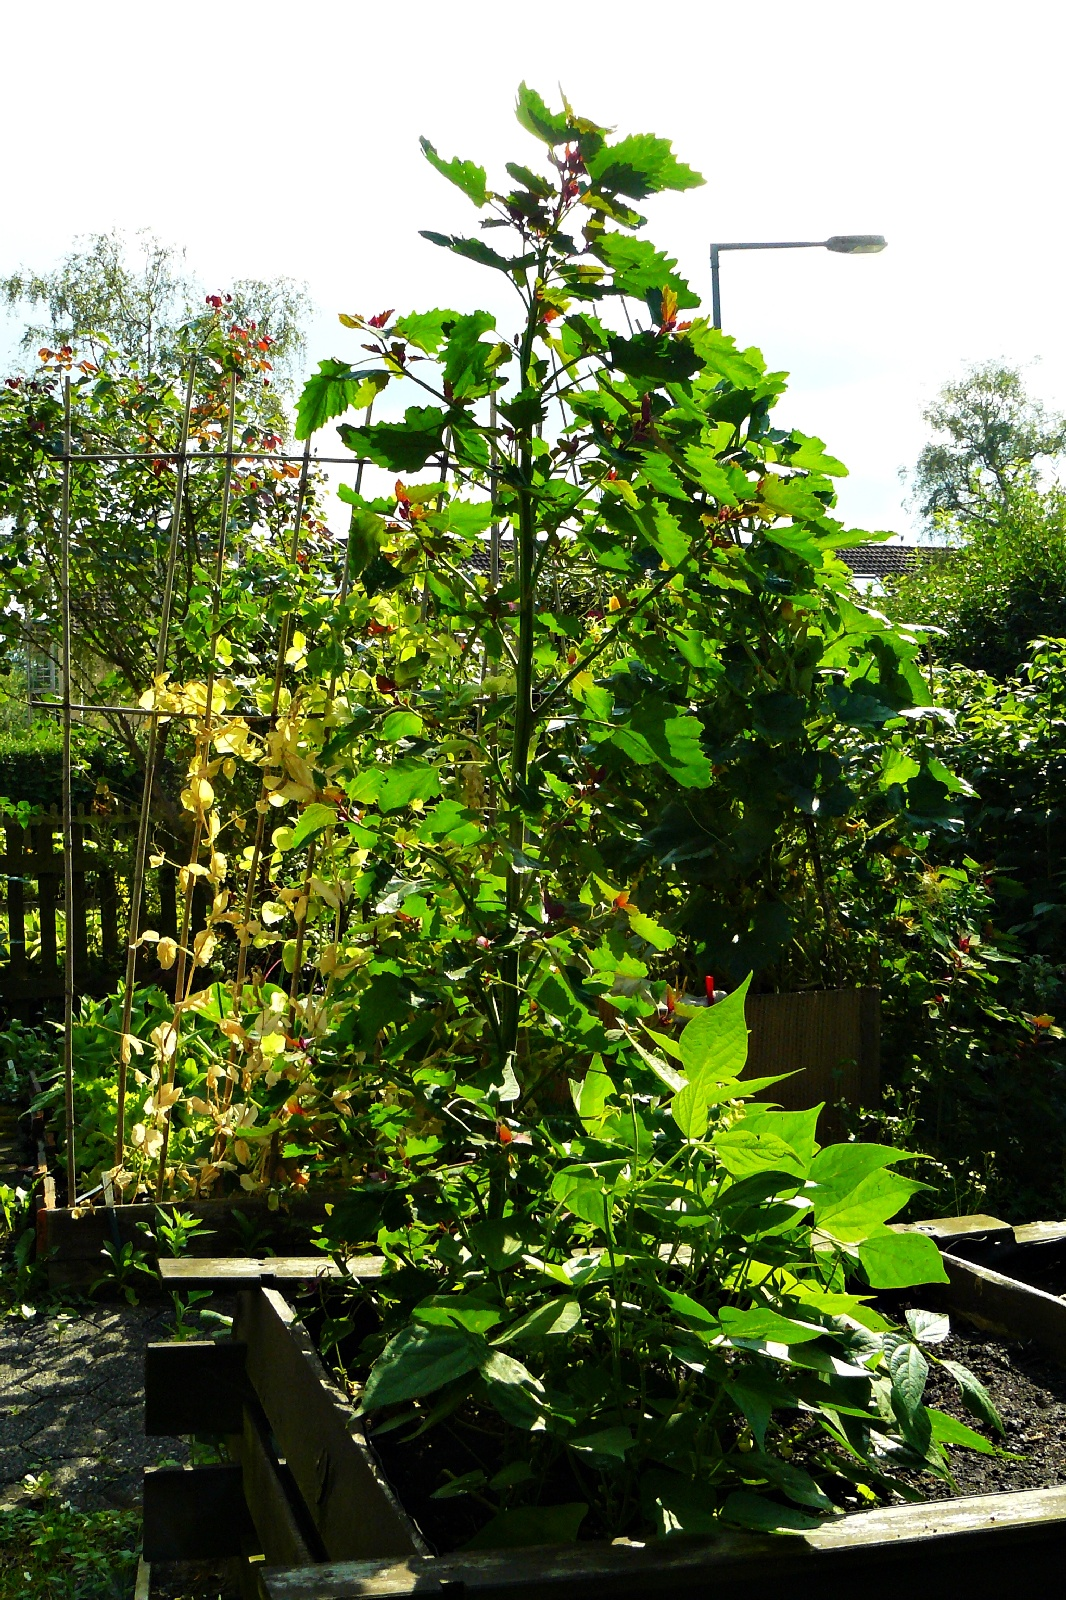 Baumspinat Chenopodium giganteum 'Magenta Spreen'